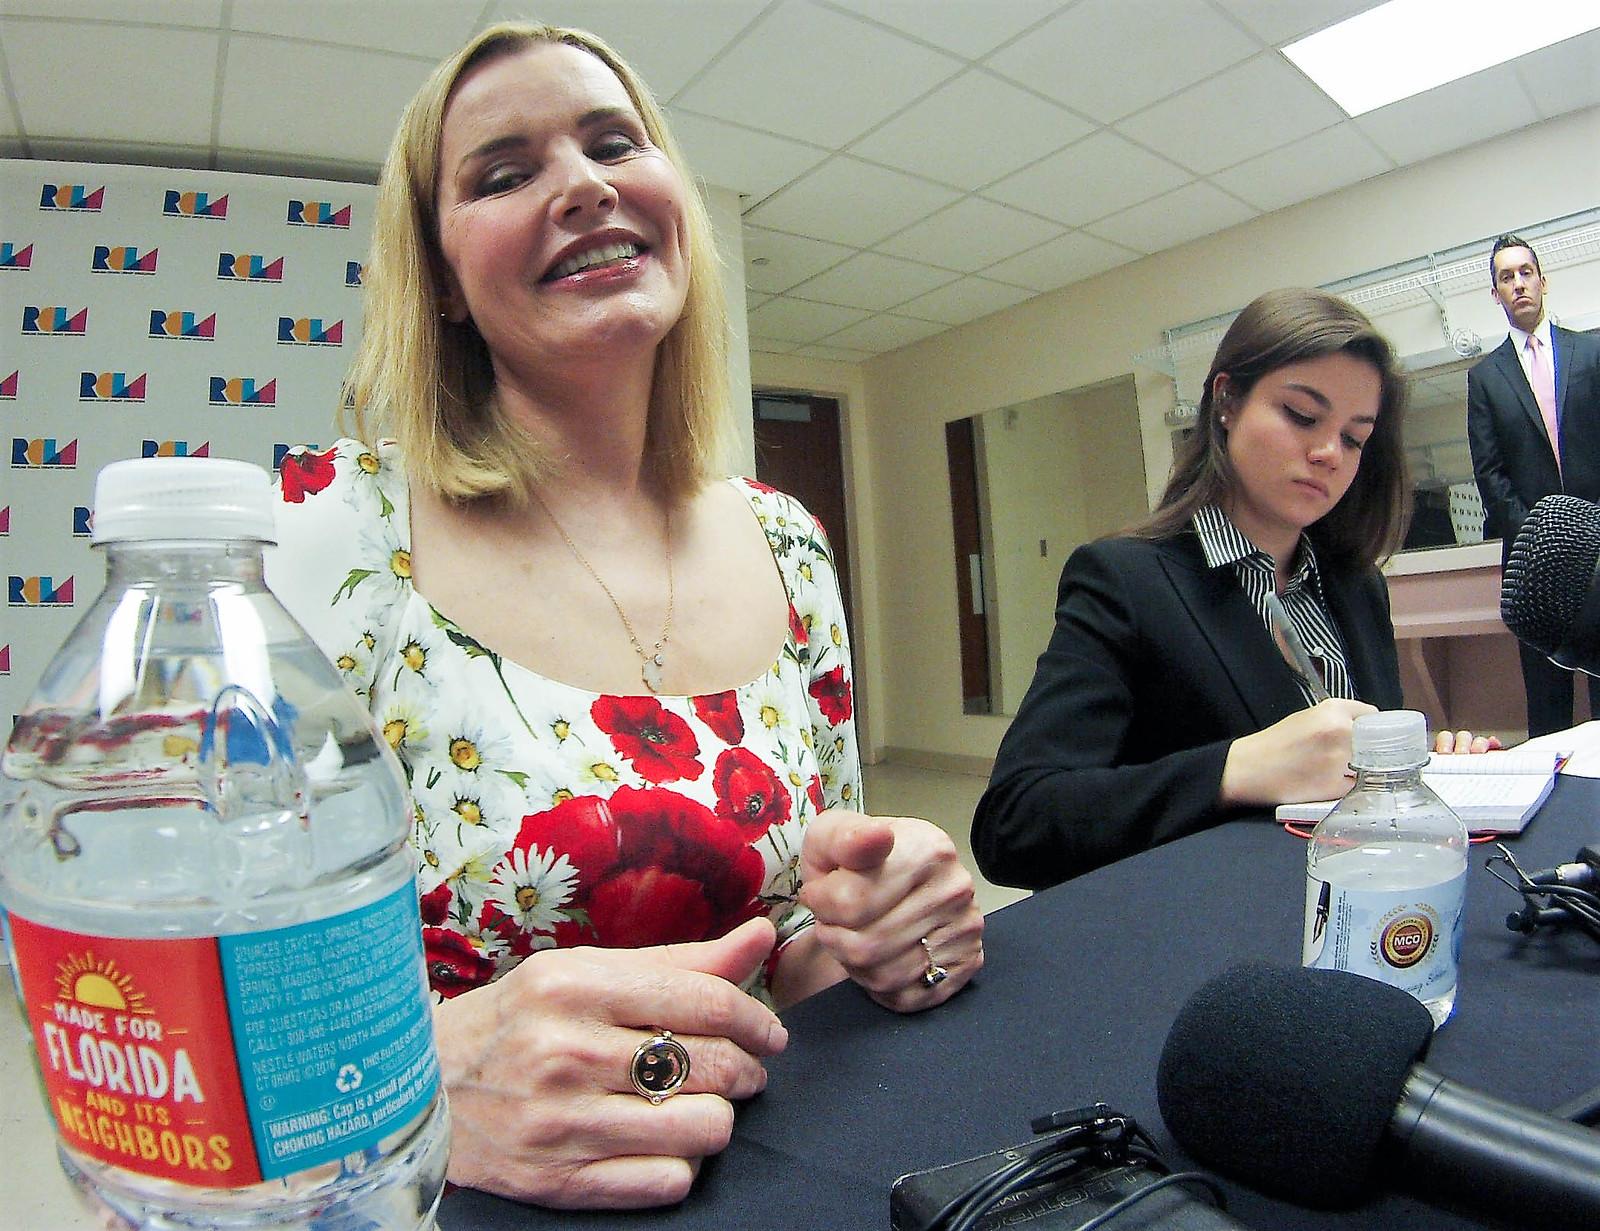 Academy Award Winner Geena Davis Met with Media Prior to Her Lectures in Sarasota, Fla., Feb. 13, 2017.